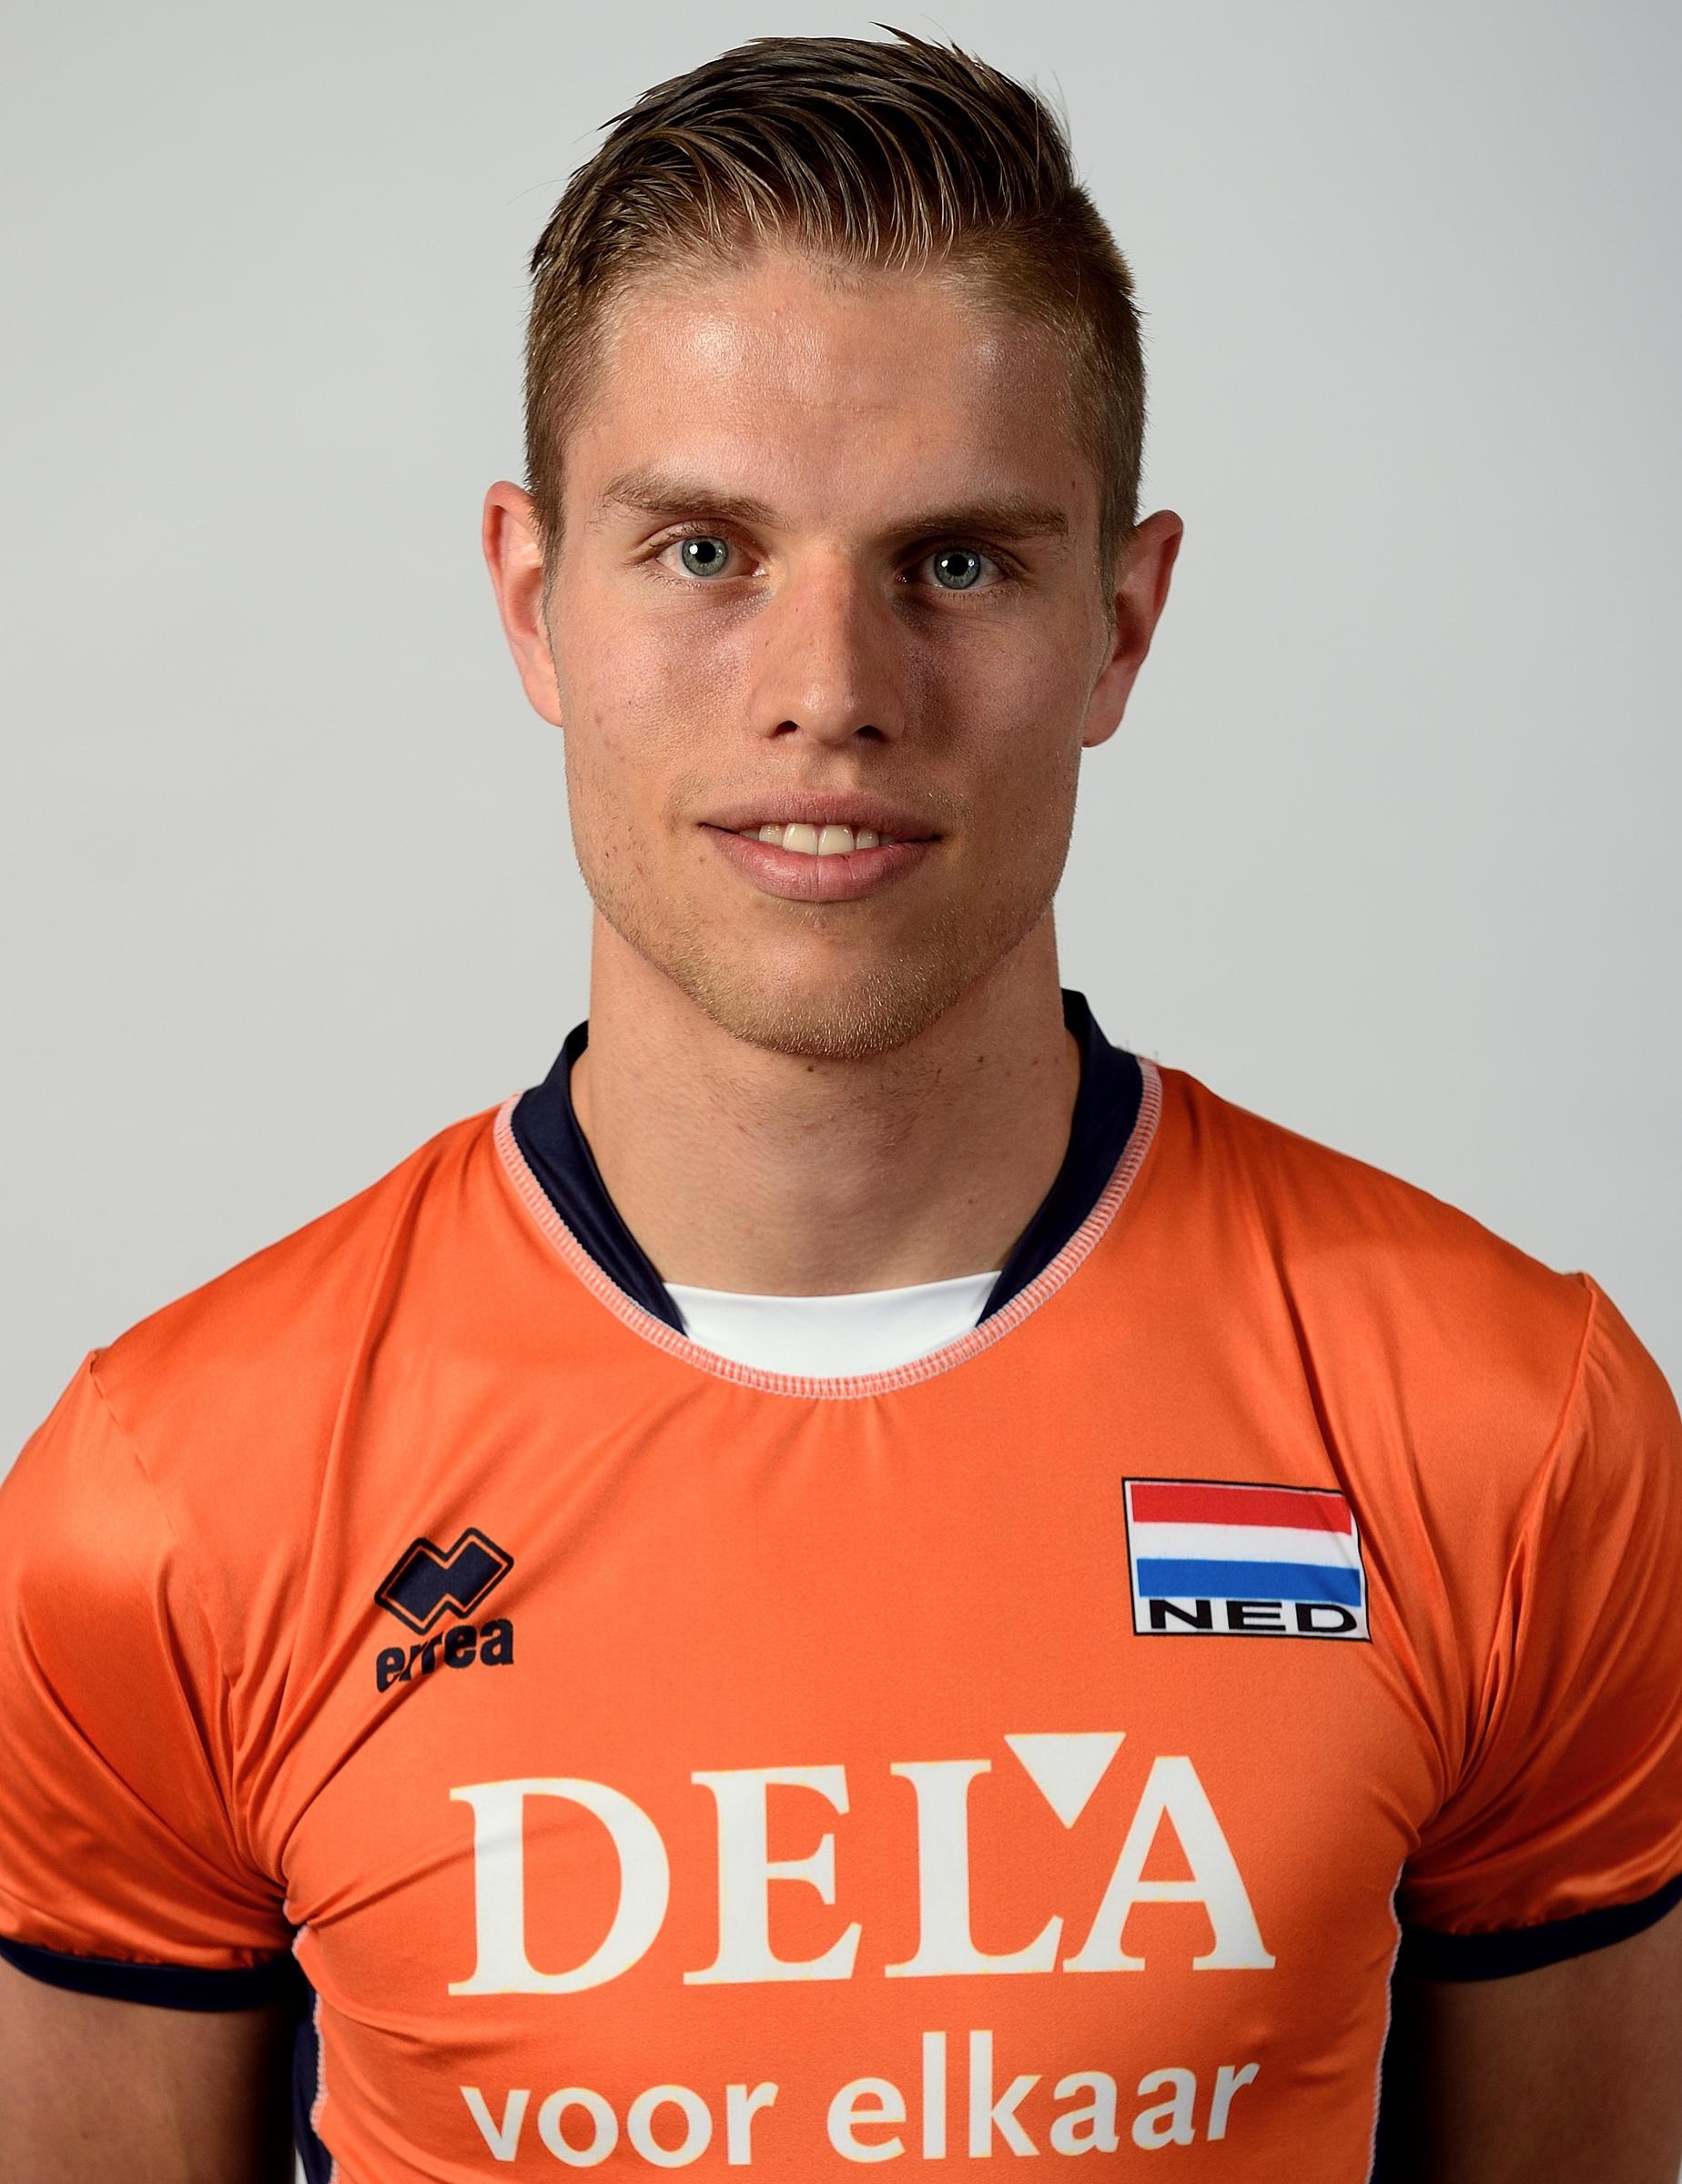 Thijs Ter Horst